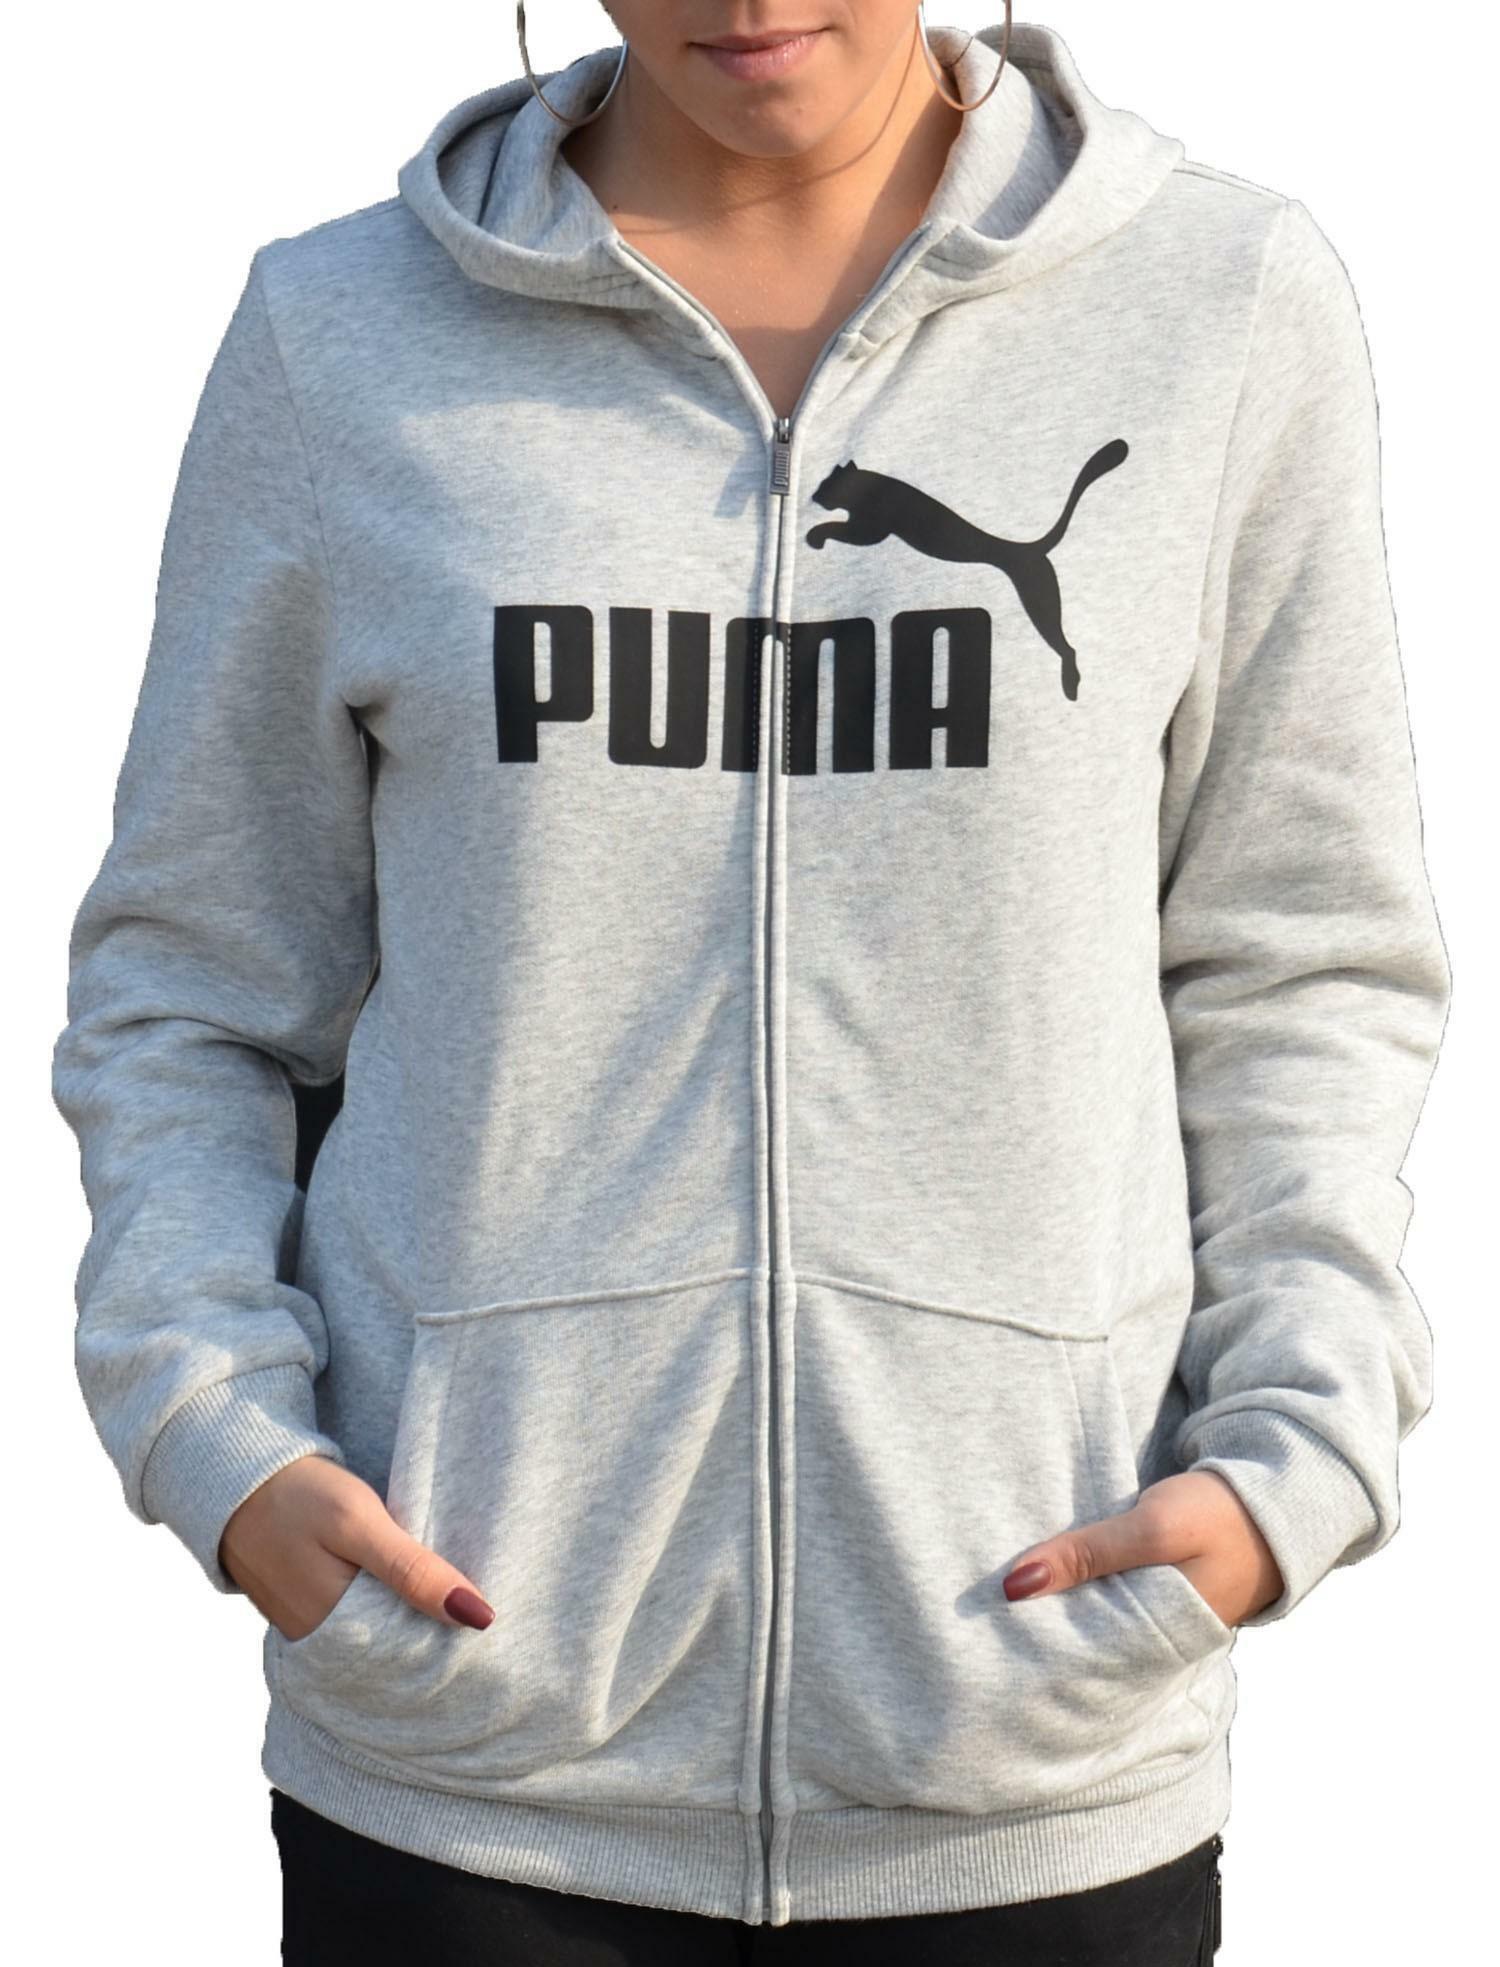 puma giacchetto bambina grigio felpato 85176004